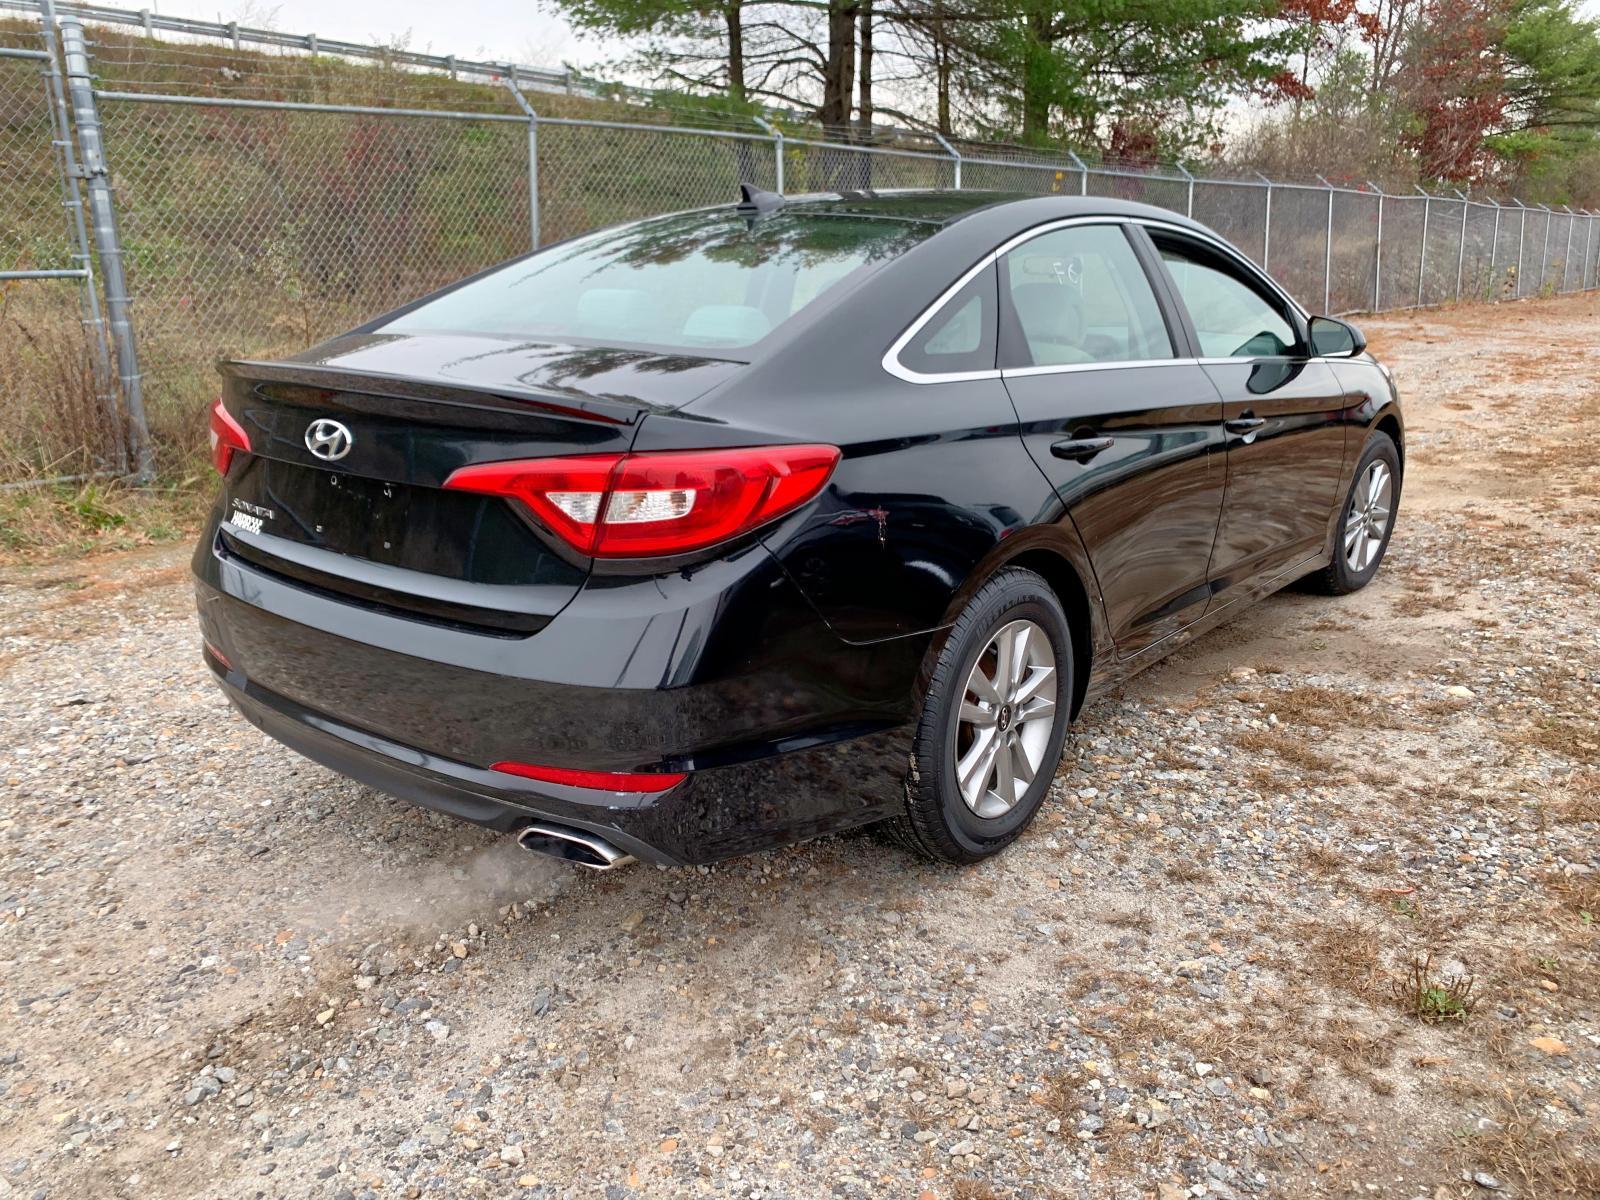 5NPE24AF8FH201473 - 2015 Hyundai Sonata Se 2.4L [Angle] View